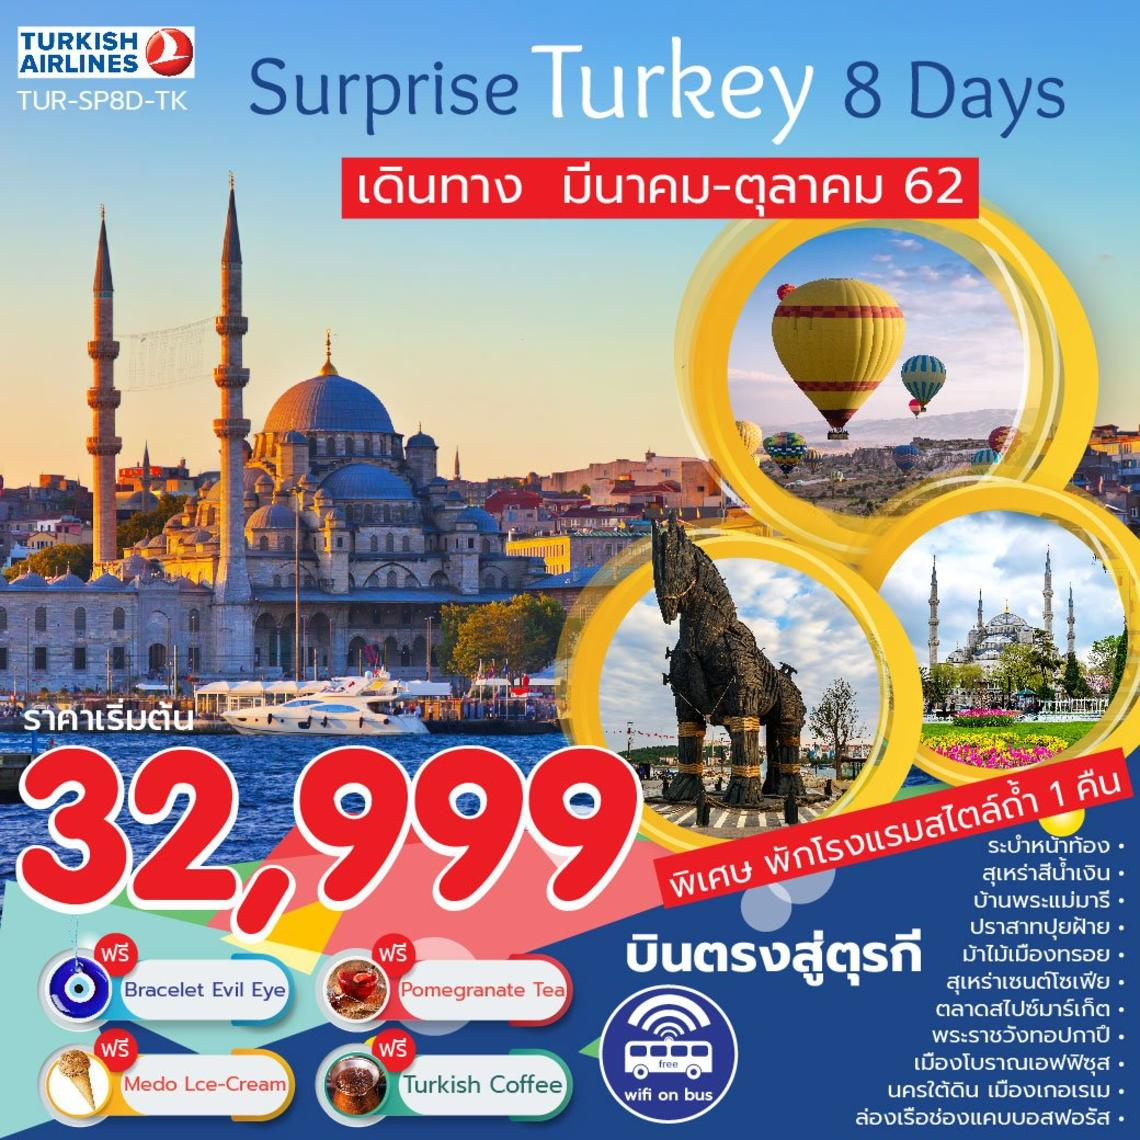 (18085) (TUR-SP8D-TK) SURPRISE TURKEY 8 DAYS 5 NIGHT BY TK